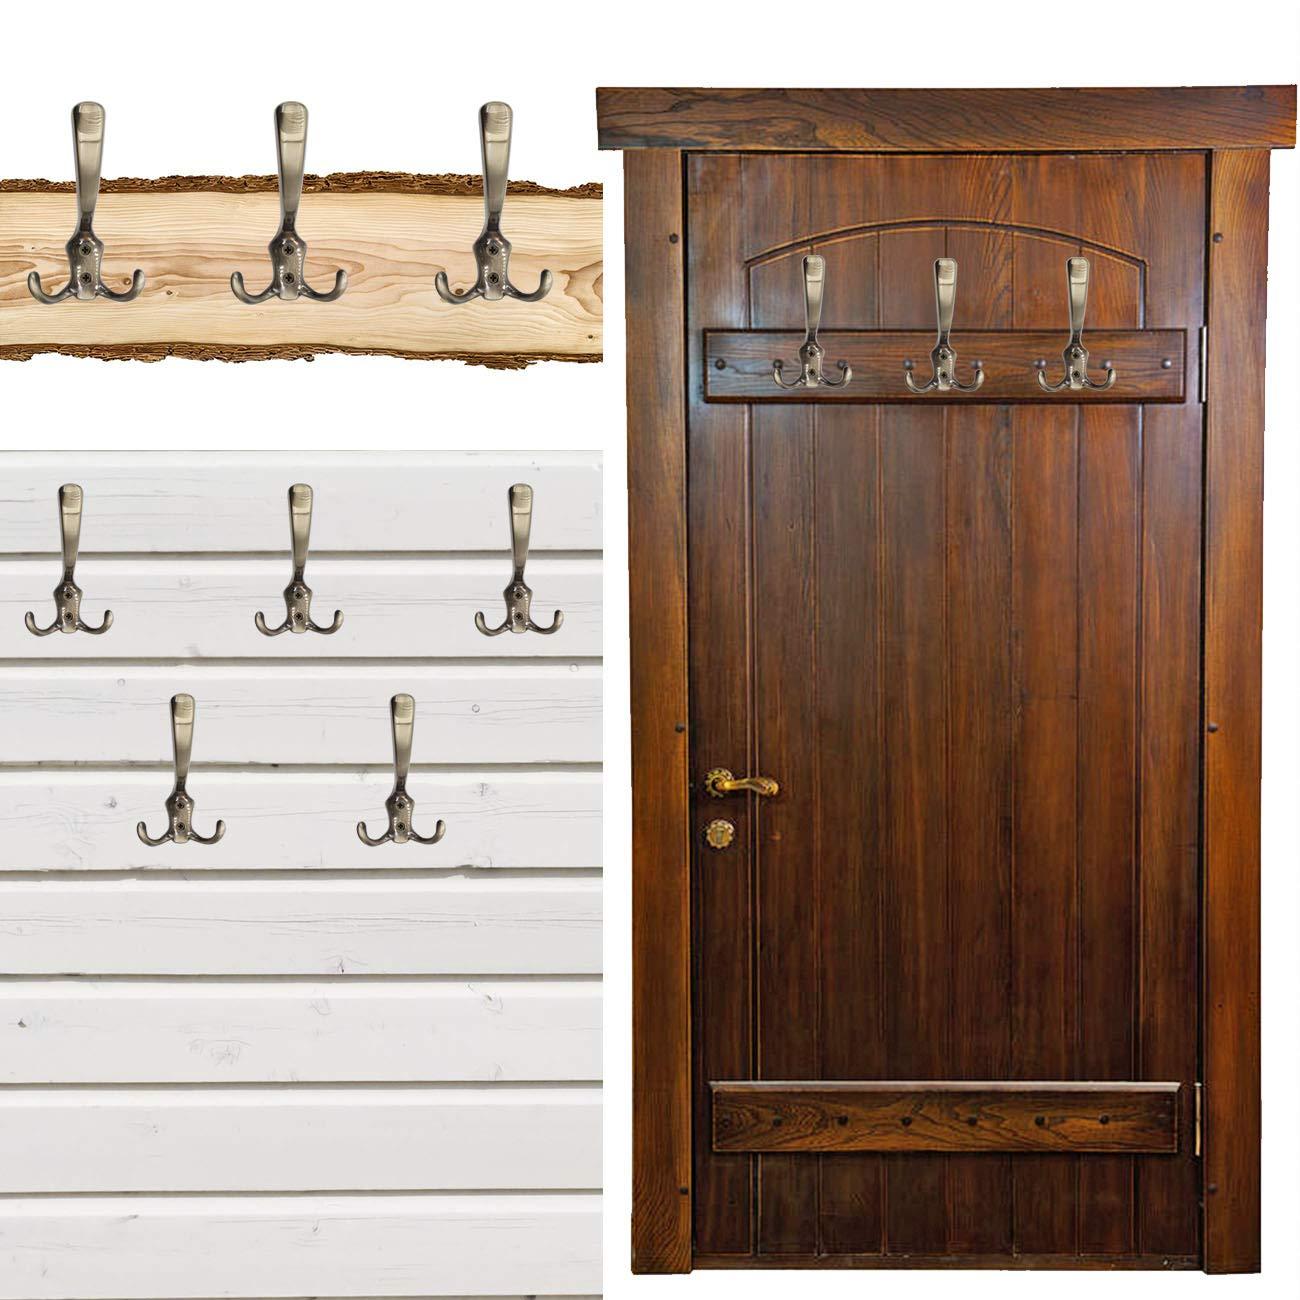 Messing Antik Optik 3x Garderoben-Haken f/ür Garderoben Wand-Bretter FUXXER/® 120 x 75 mm // 3er Set